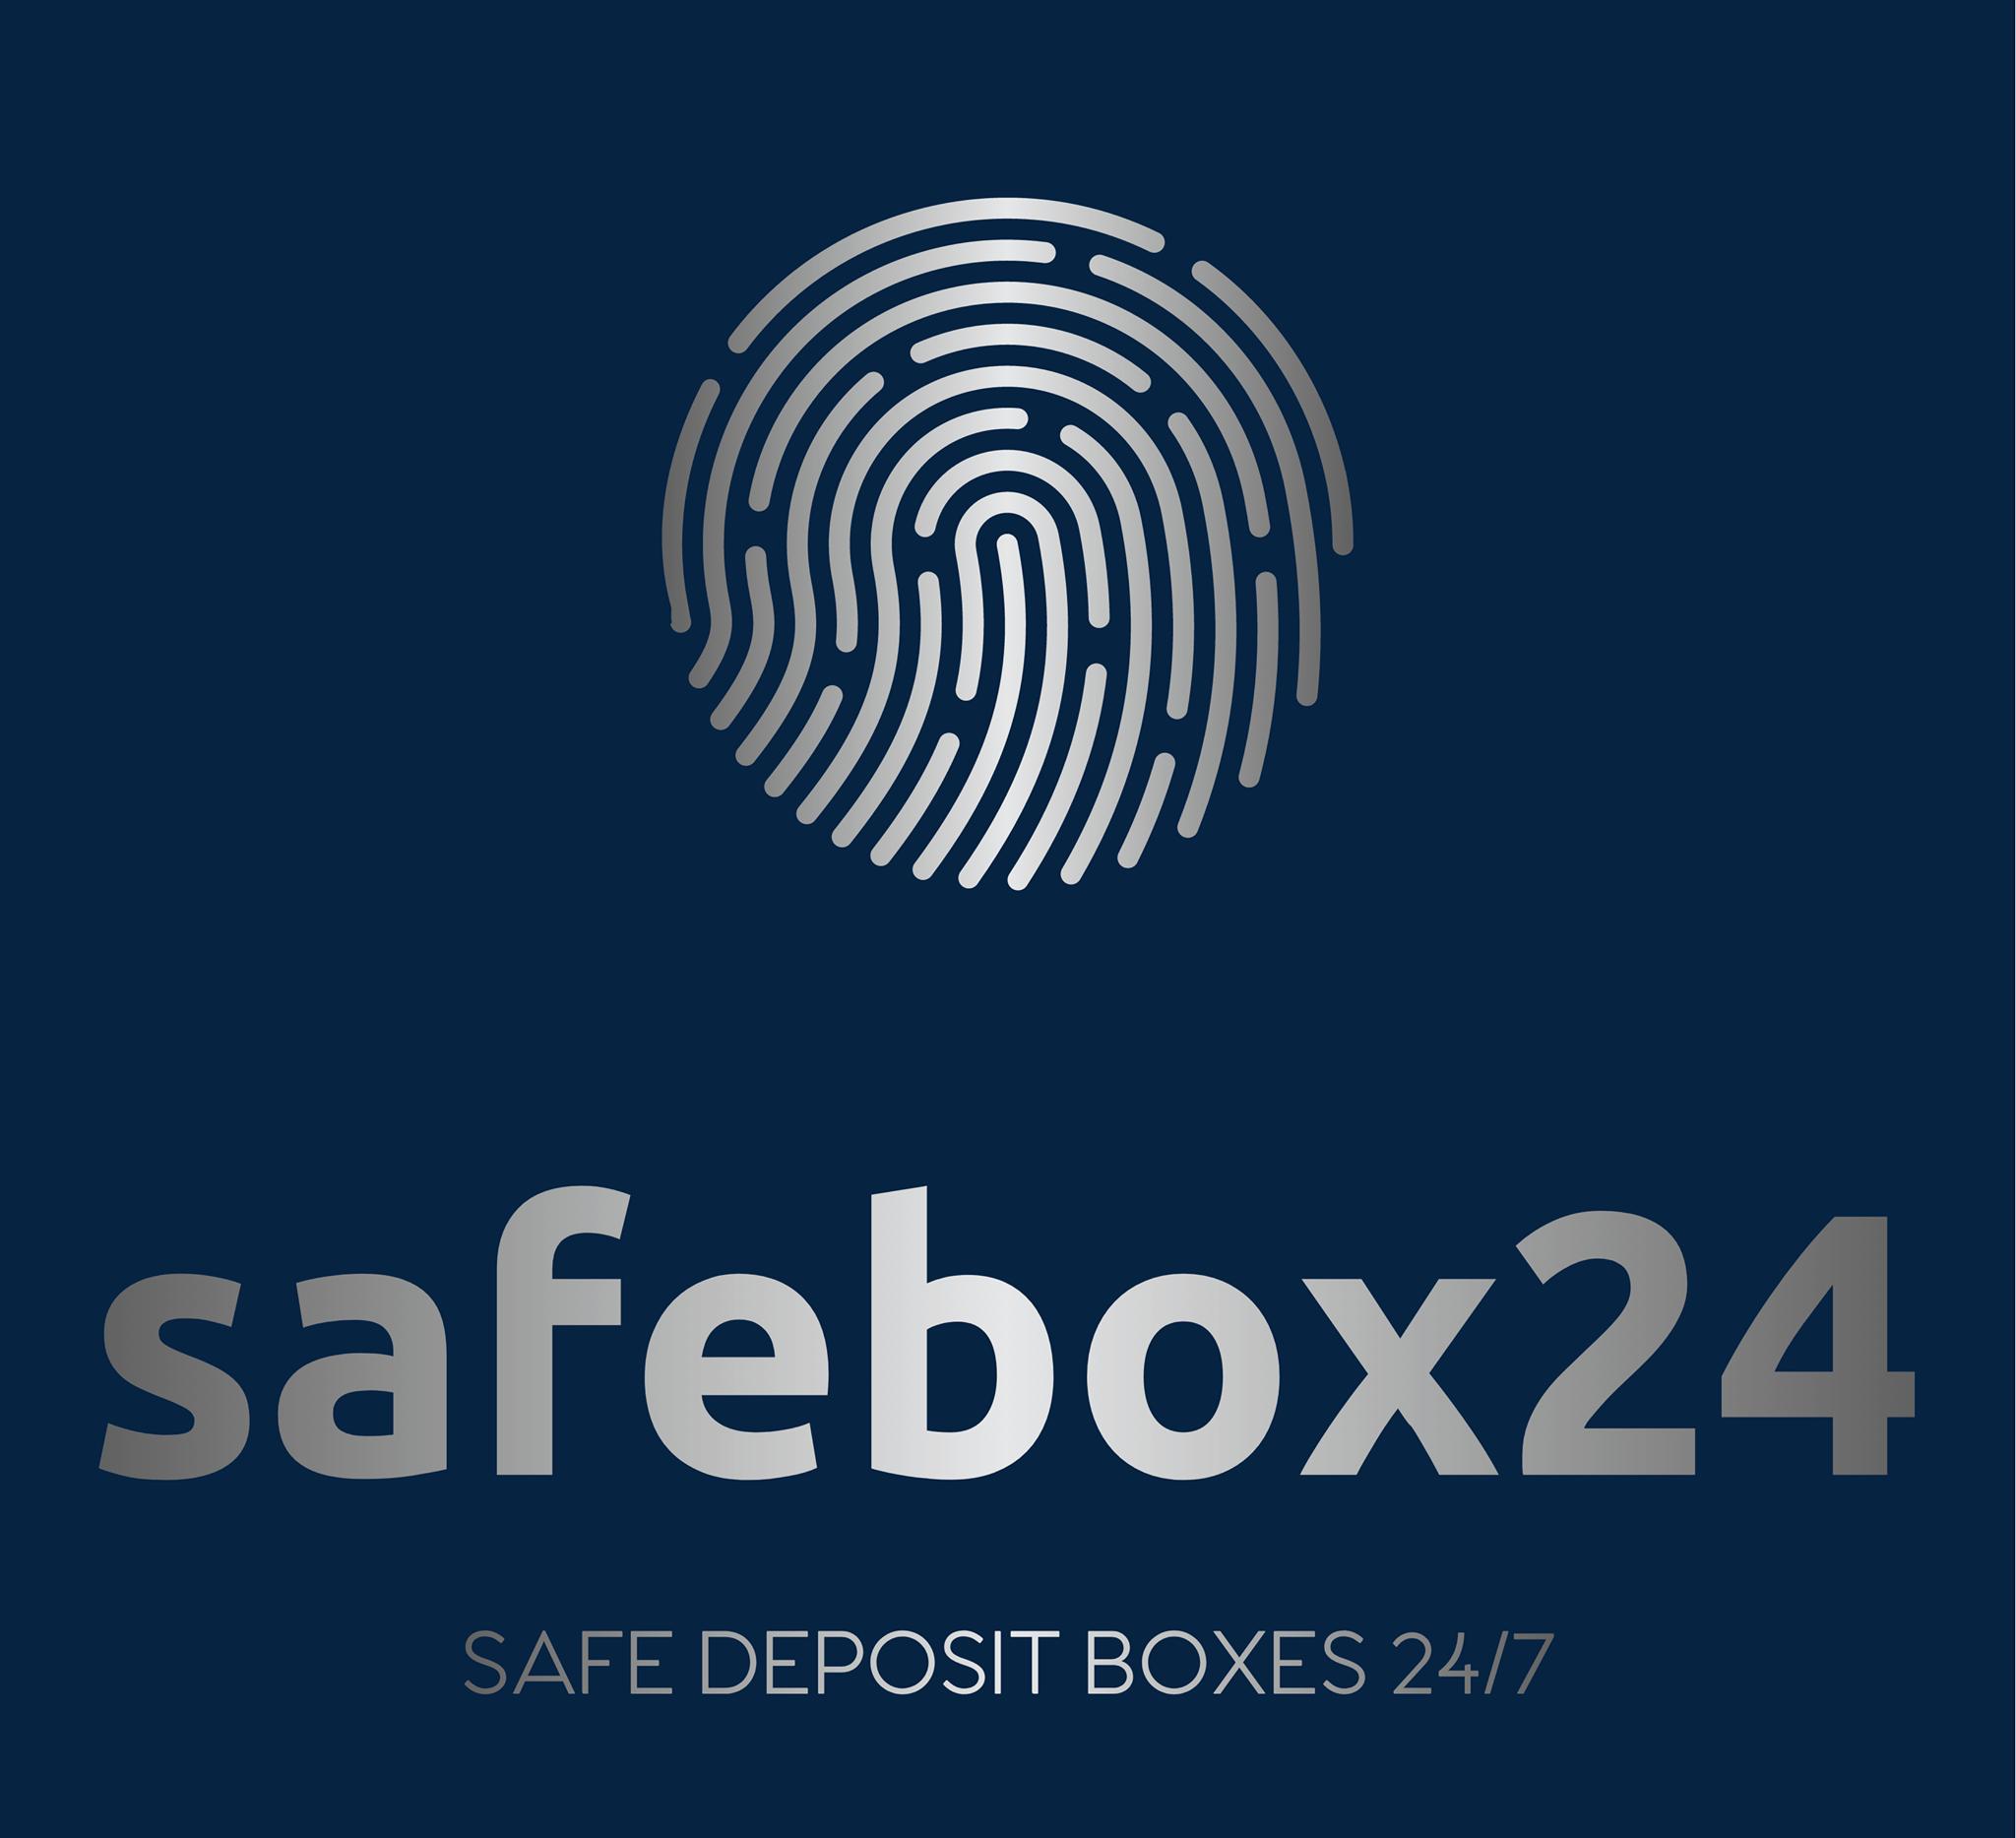 Safebox24